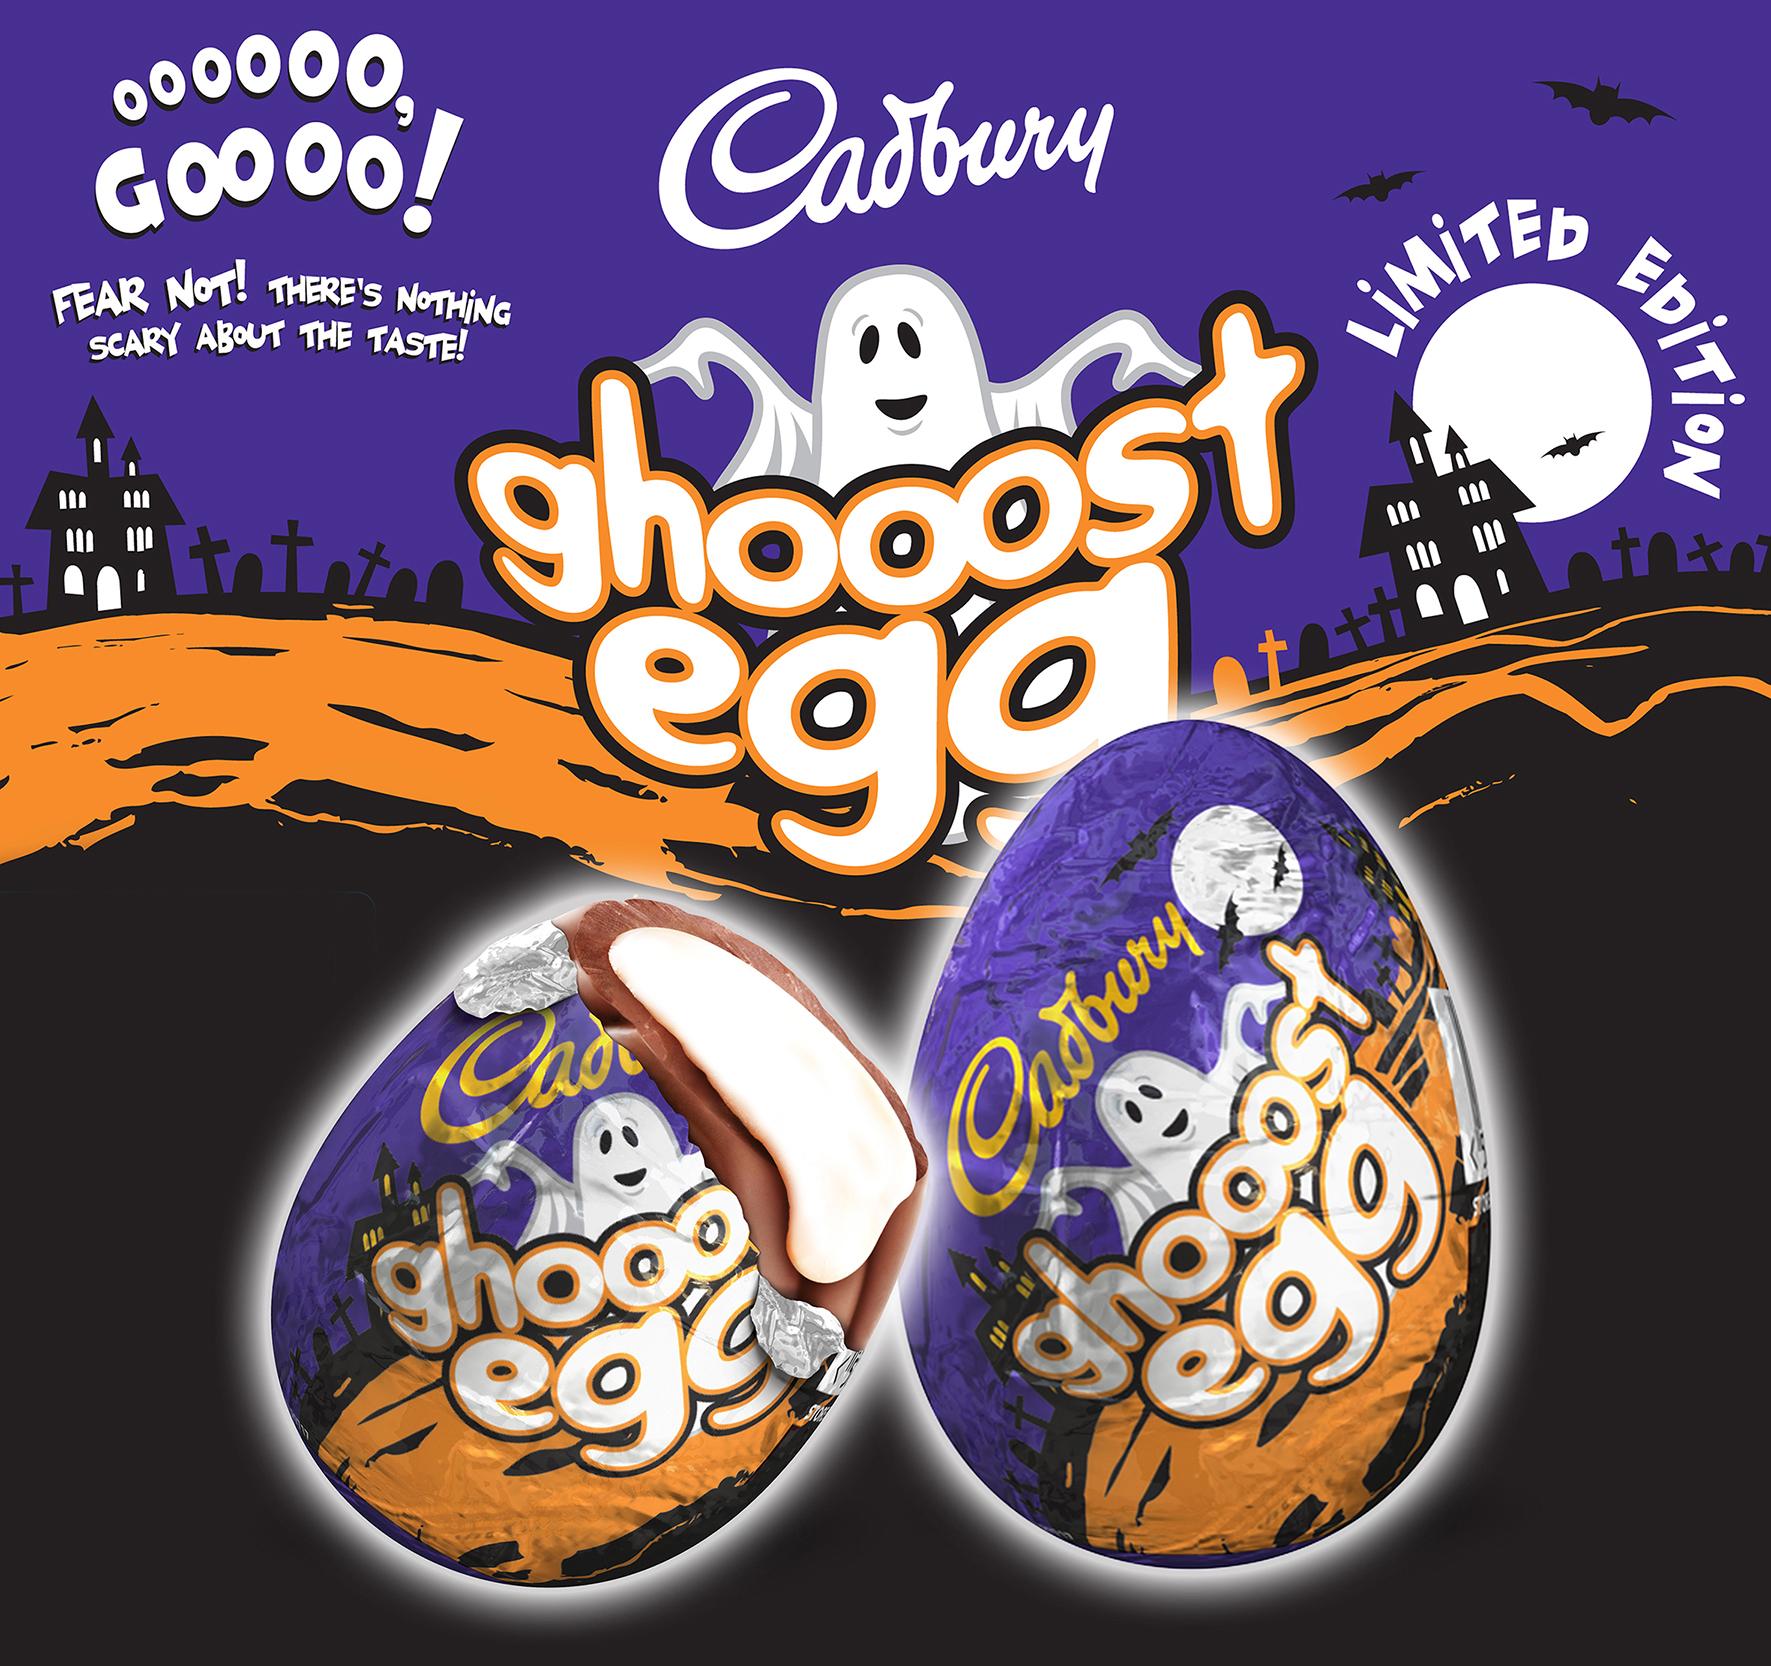 Cadbury Ghost Egg